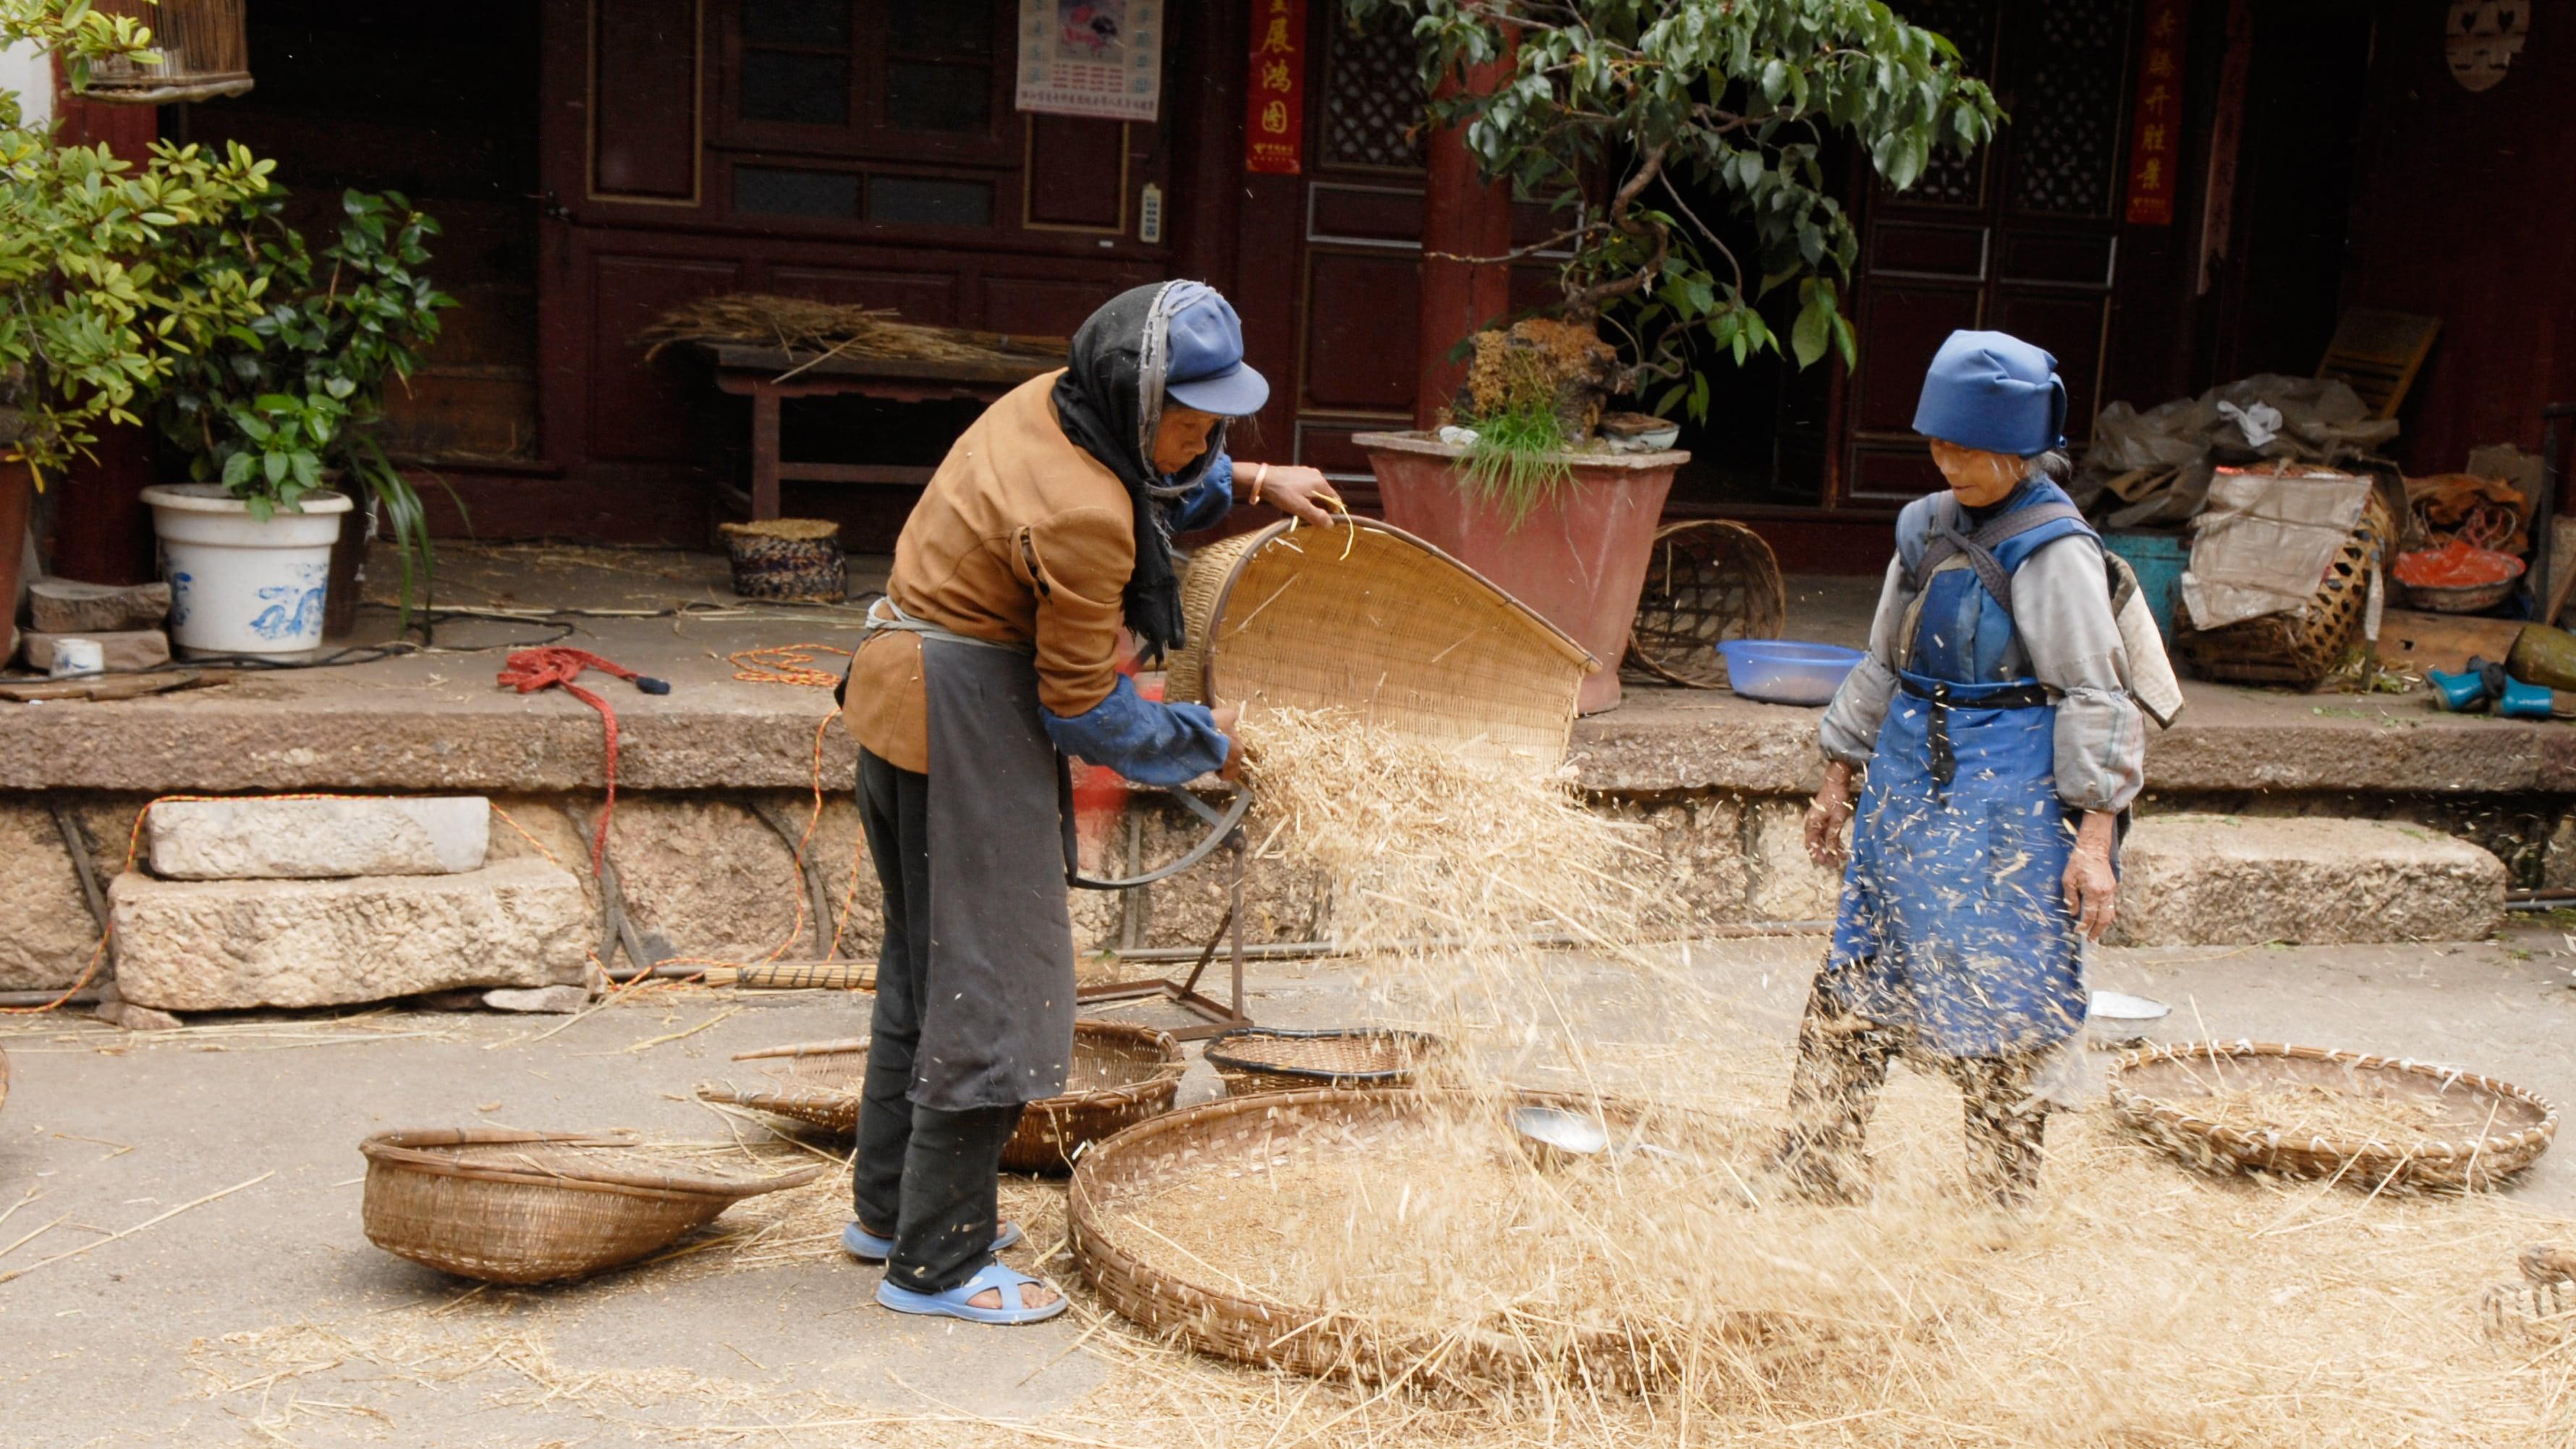 china-agriculture-harvest-hand-labor-108e4b6c7758b4e892da4c403579b782